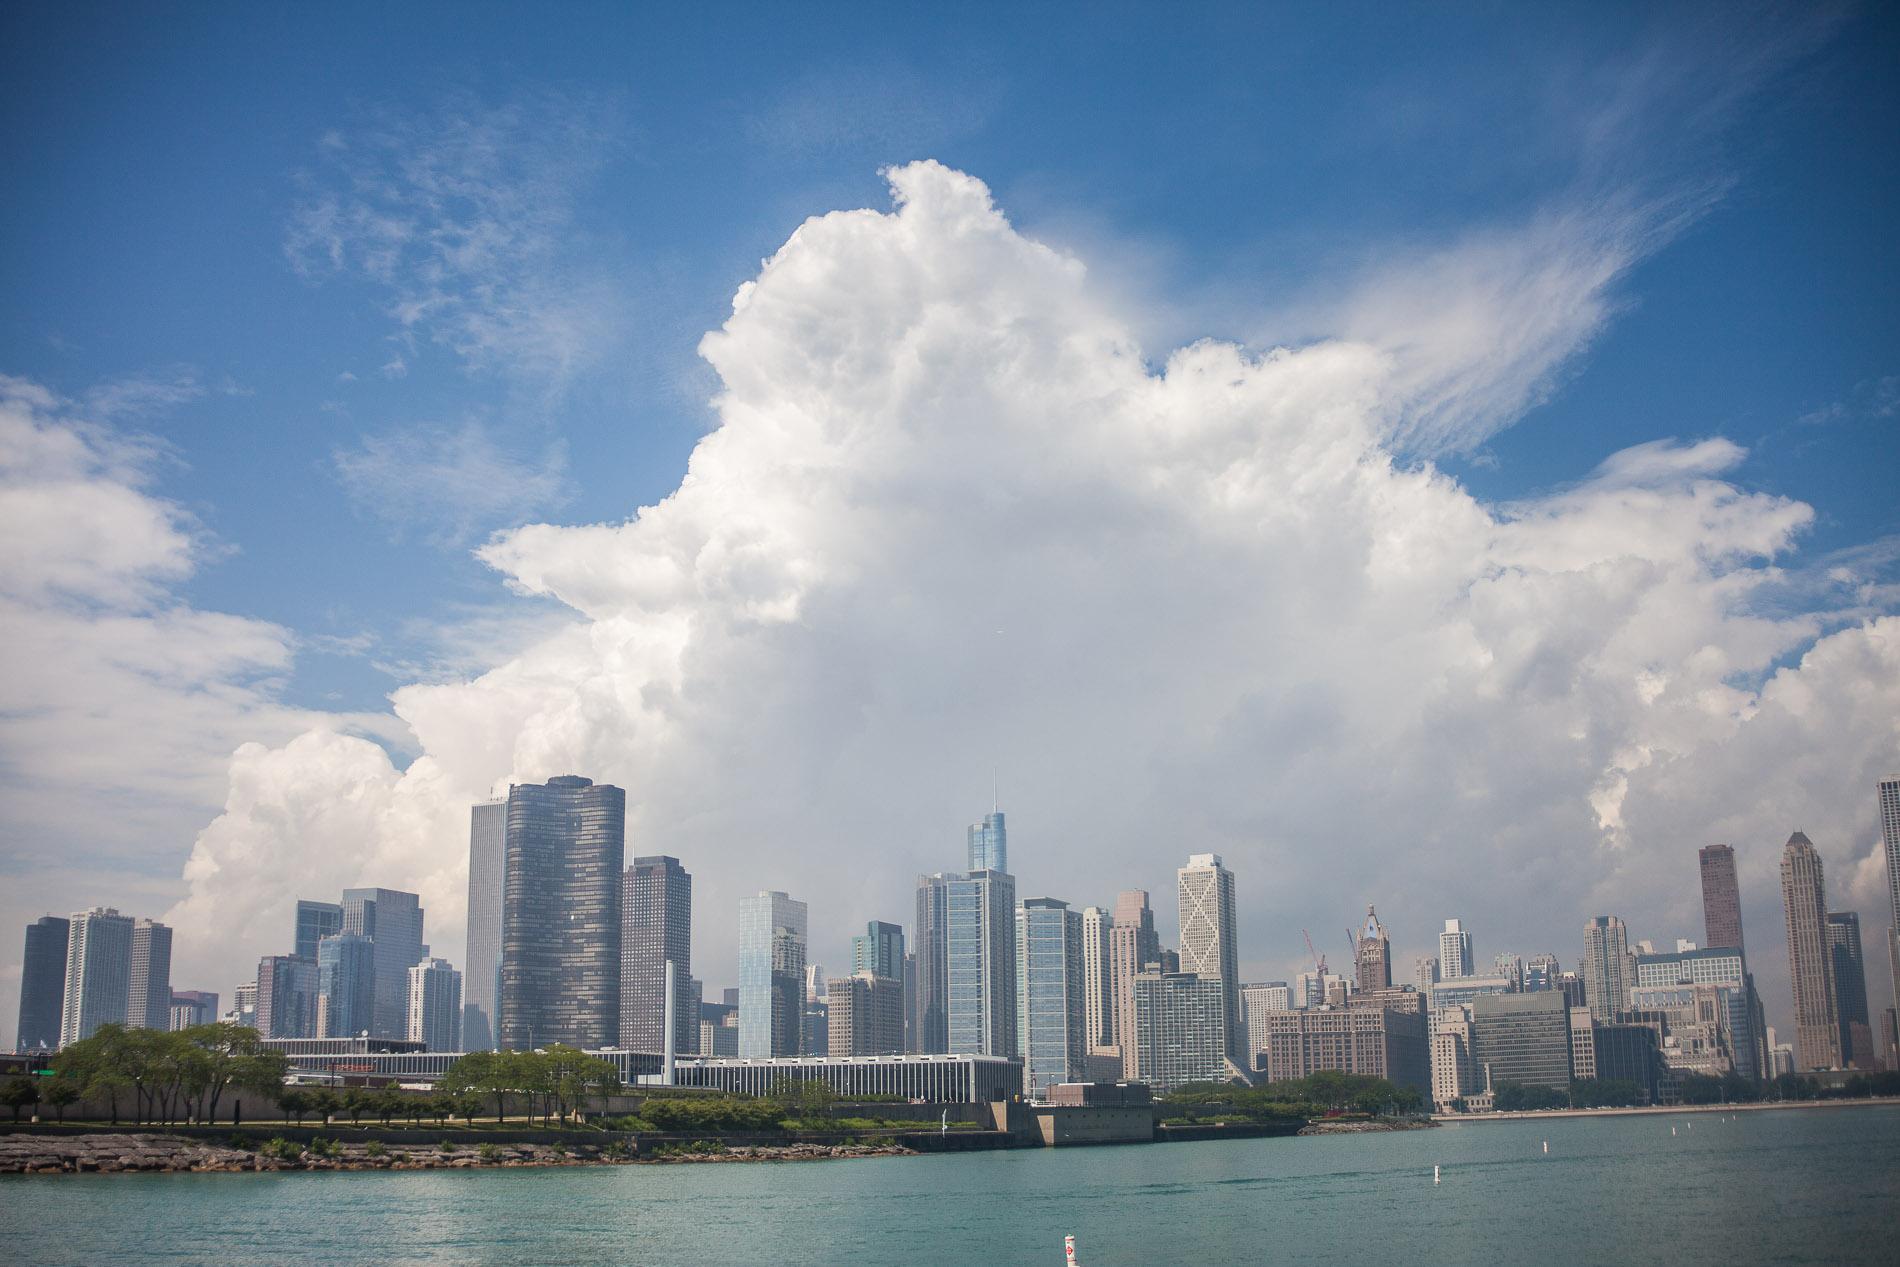 Chicago   07 . 14 . 13 - 07 . 17 . 13